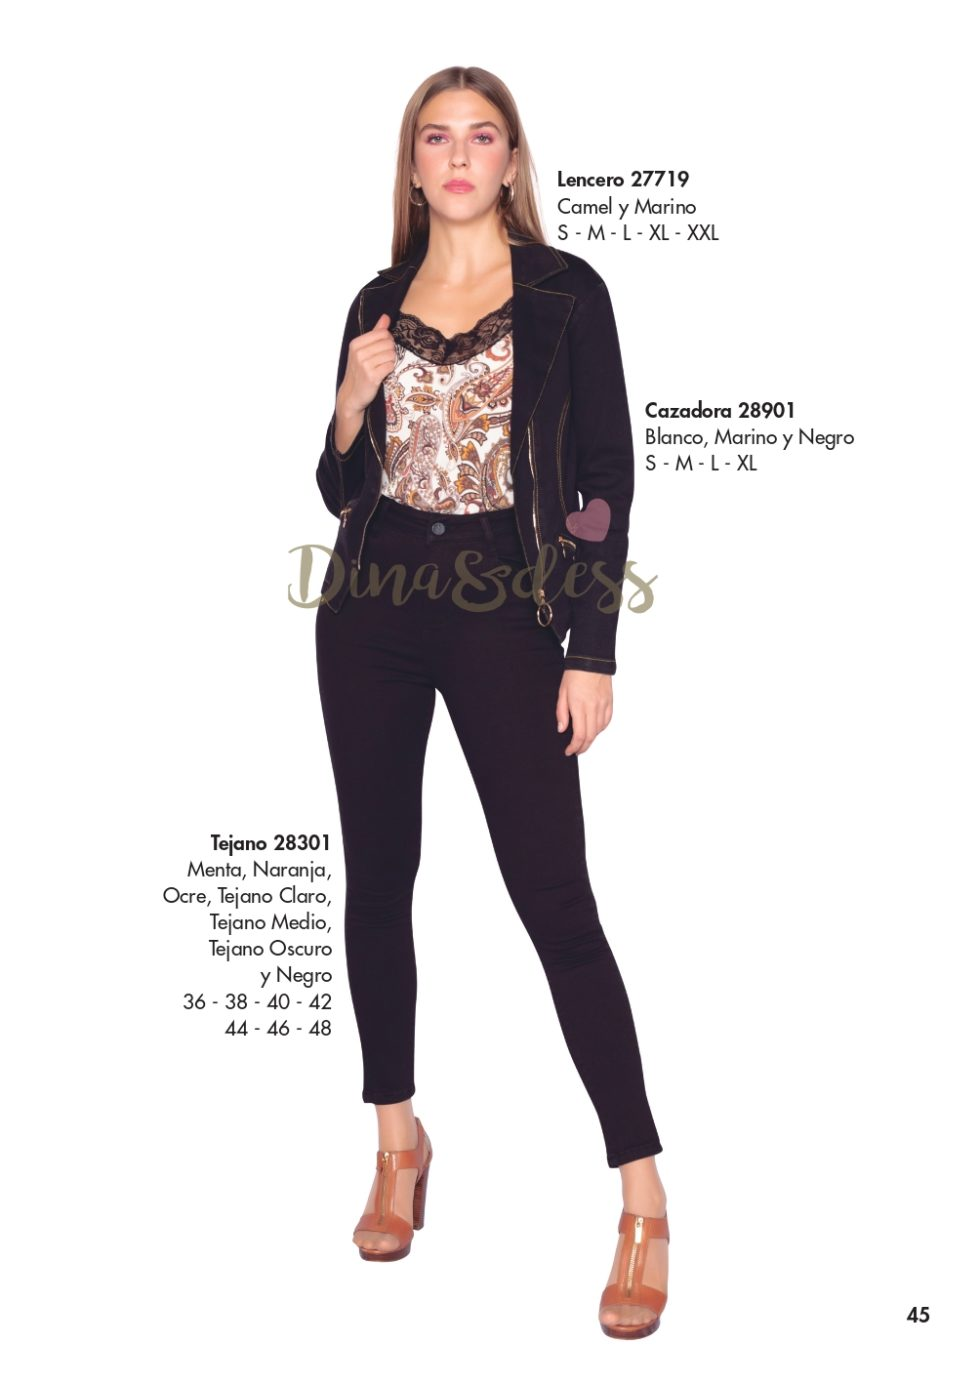 Verano 2021 Dina&Dess Clientes_page-0047